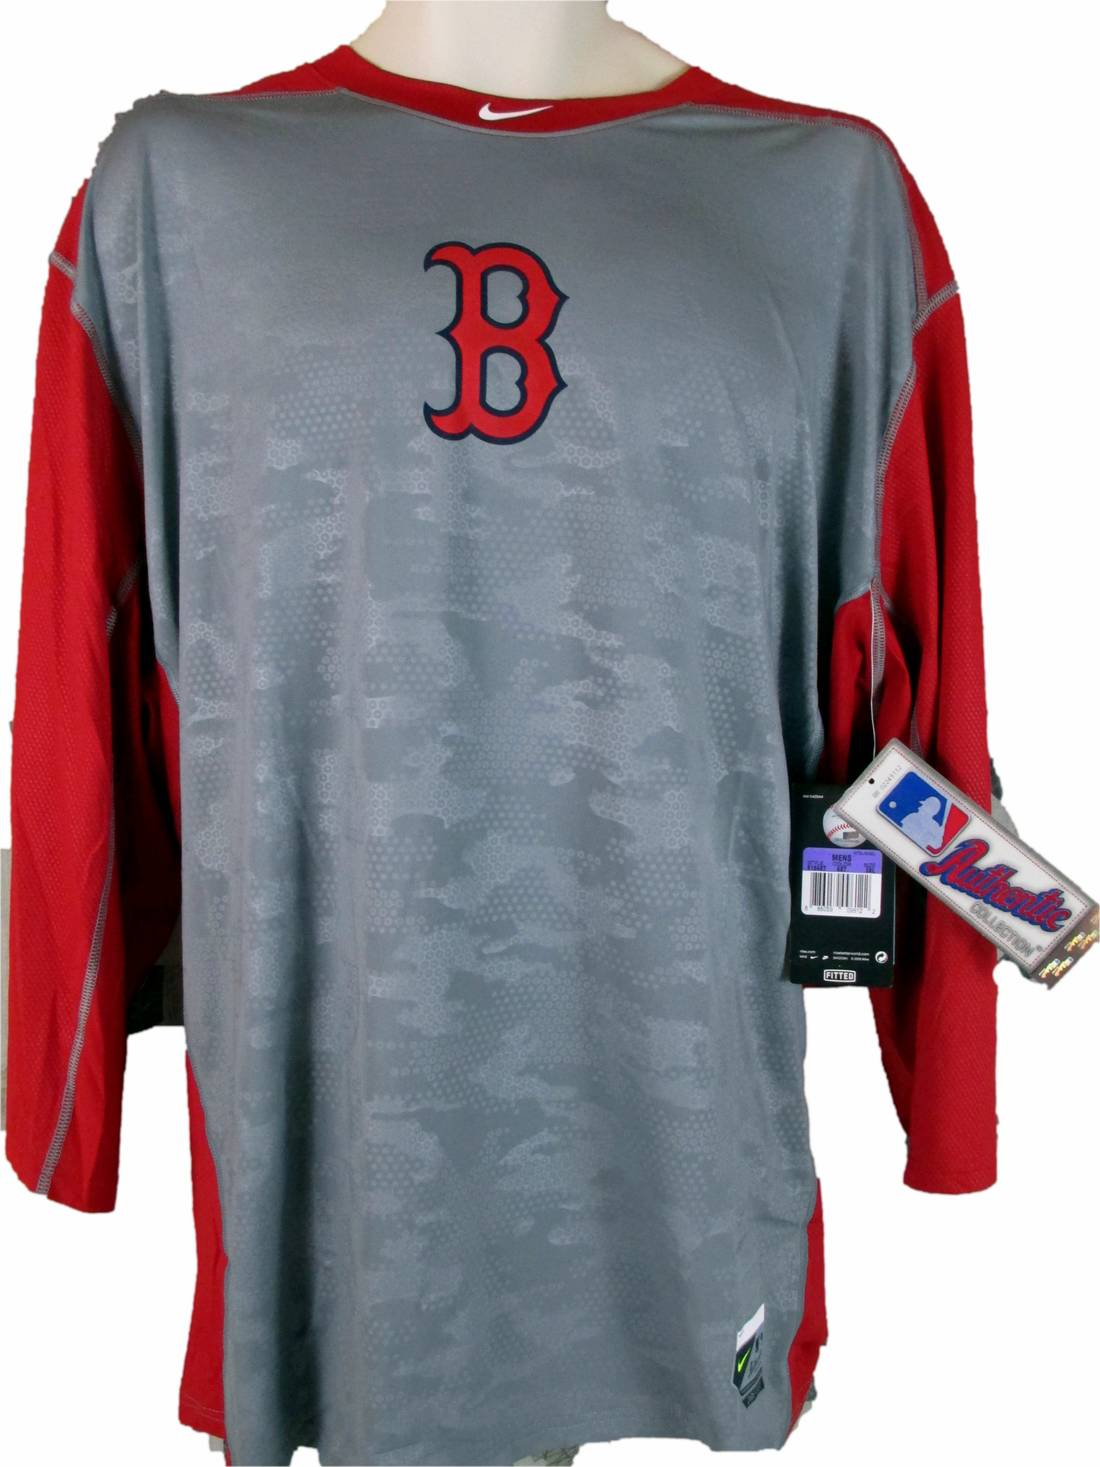 16a7d339 Nike Red Sox Tee Shirt - DREAMWORKS